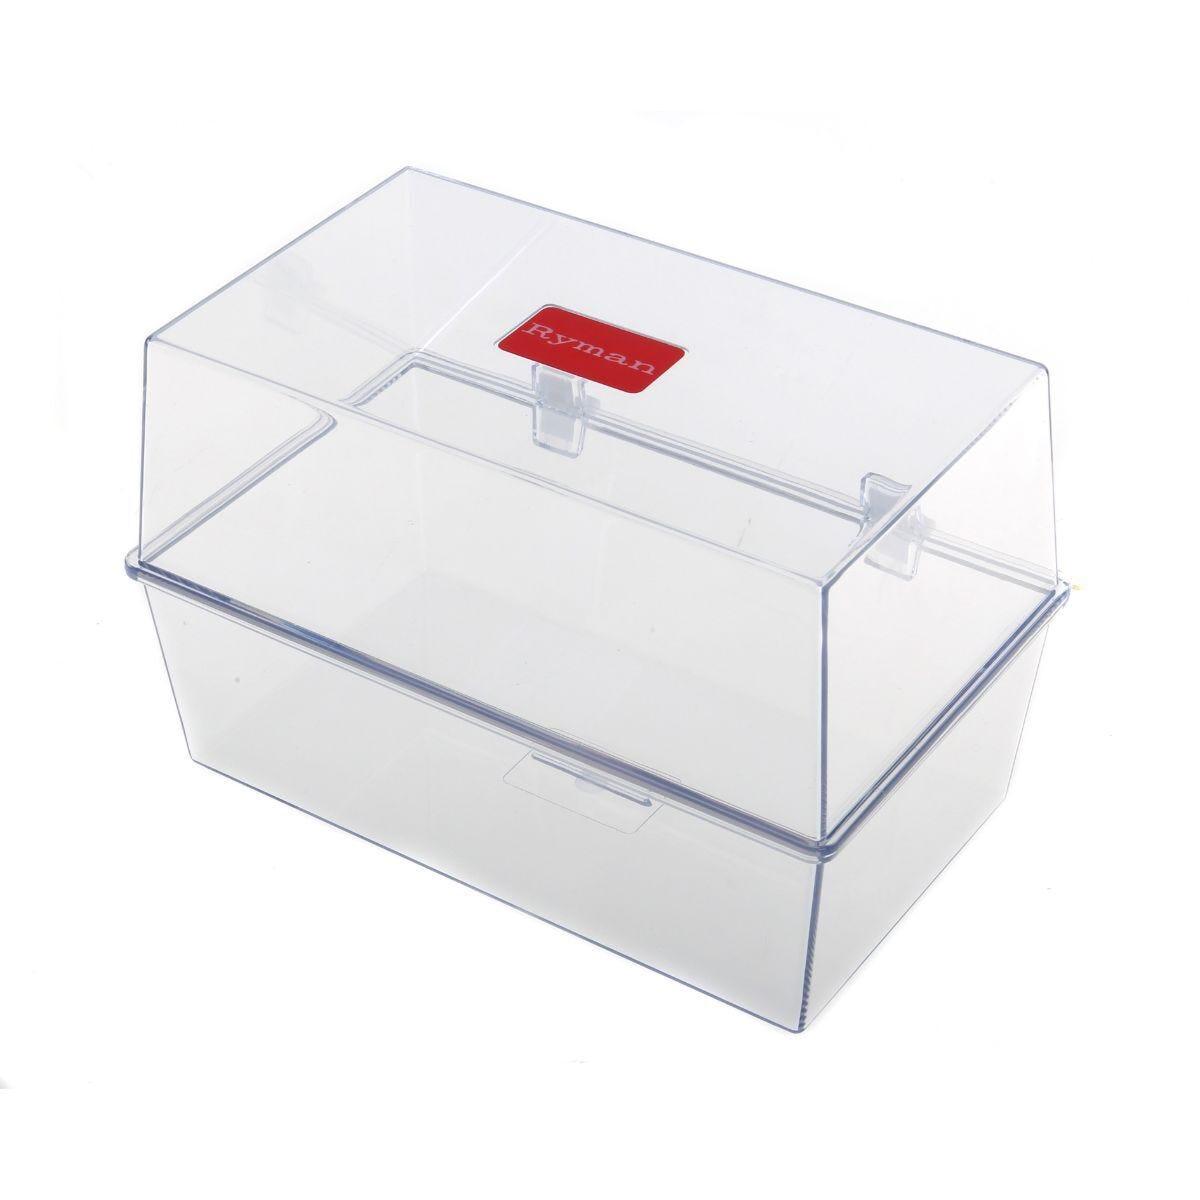 Ryman Index Box 203x127mm